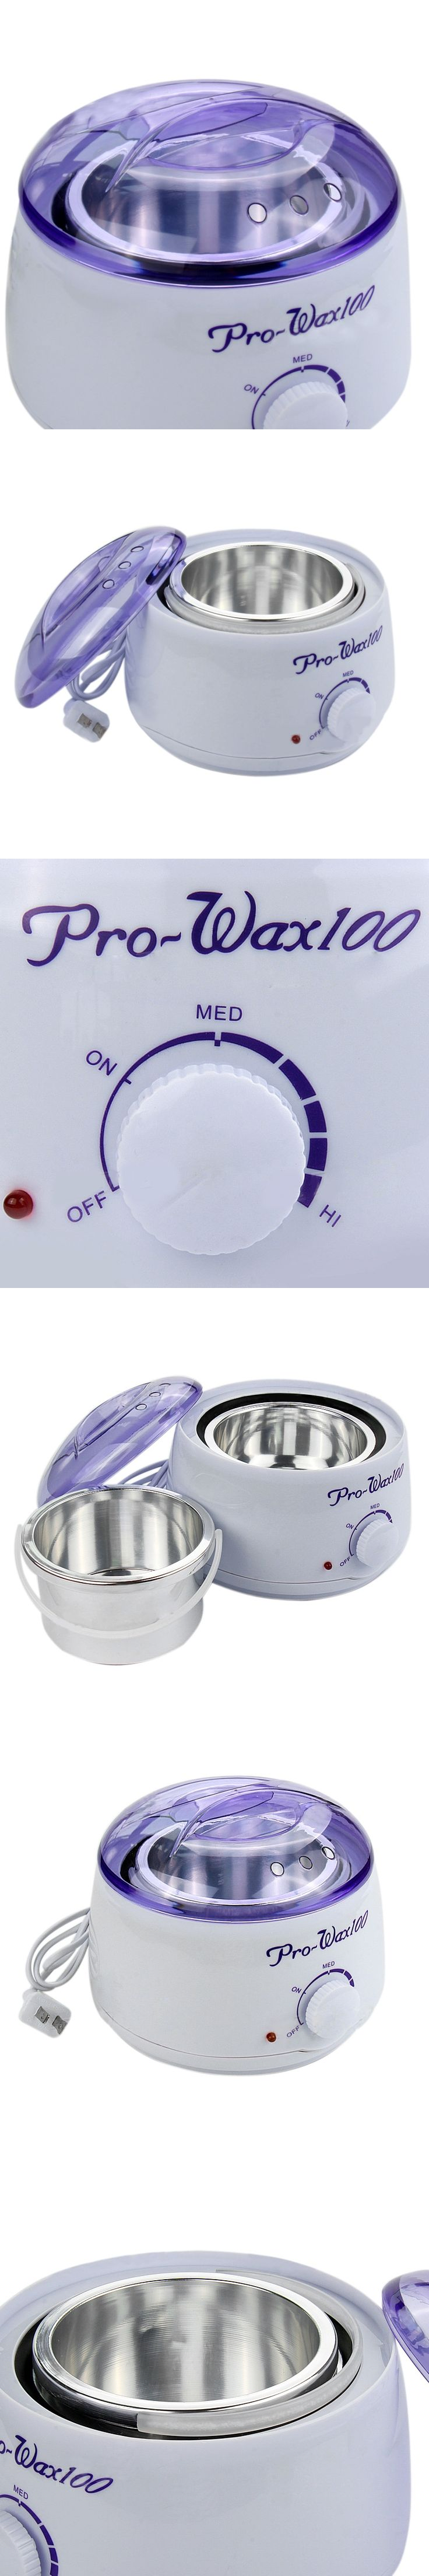 Warmer Wax Heater Professional Mini SPA Hands Feet paraffin Wax Machine Emperature Control Kerotherapy Depilatory